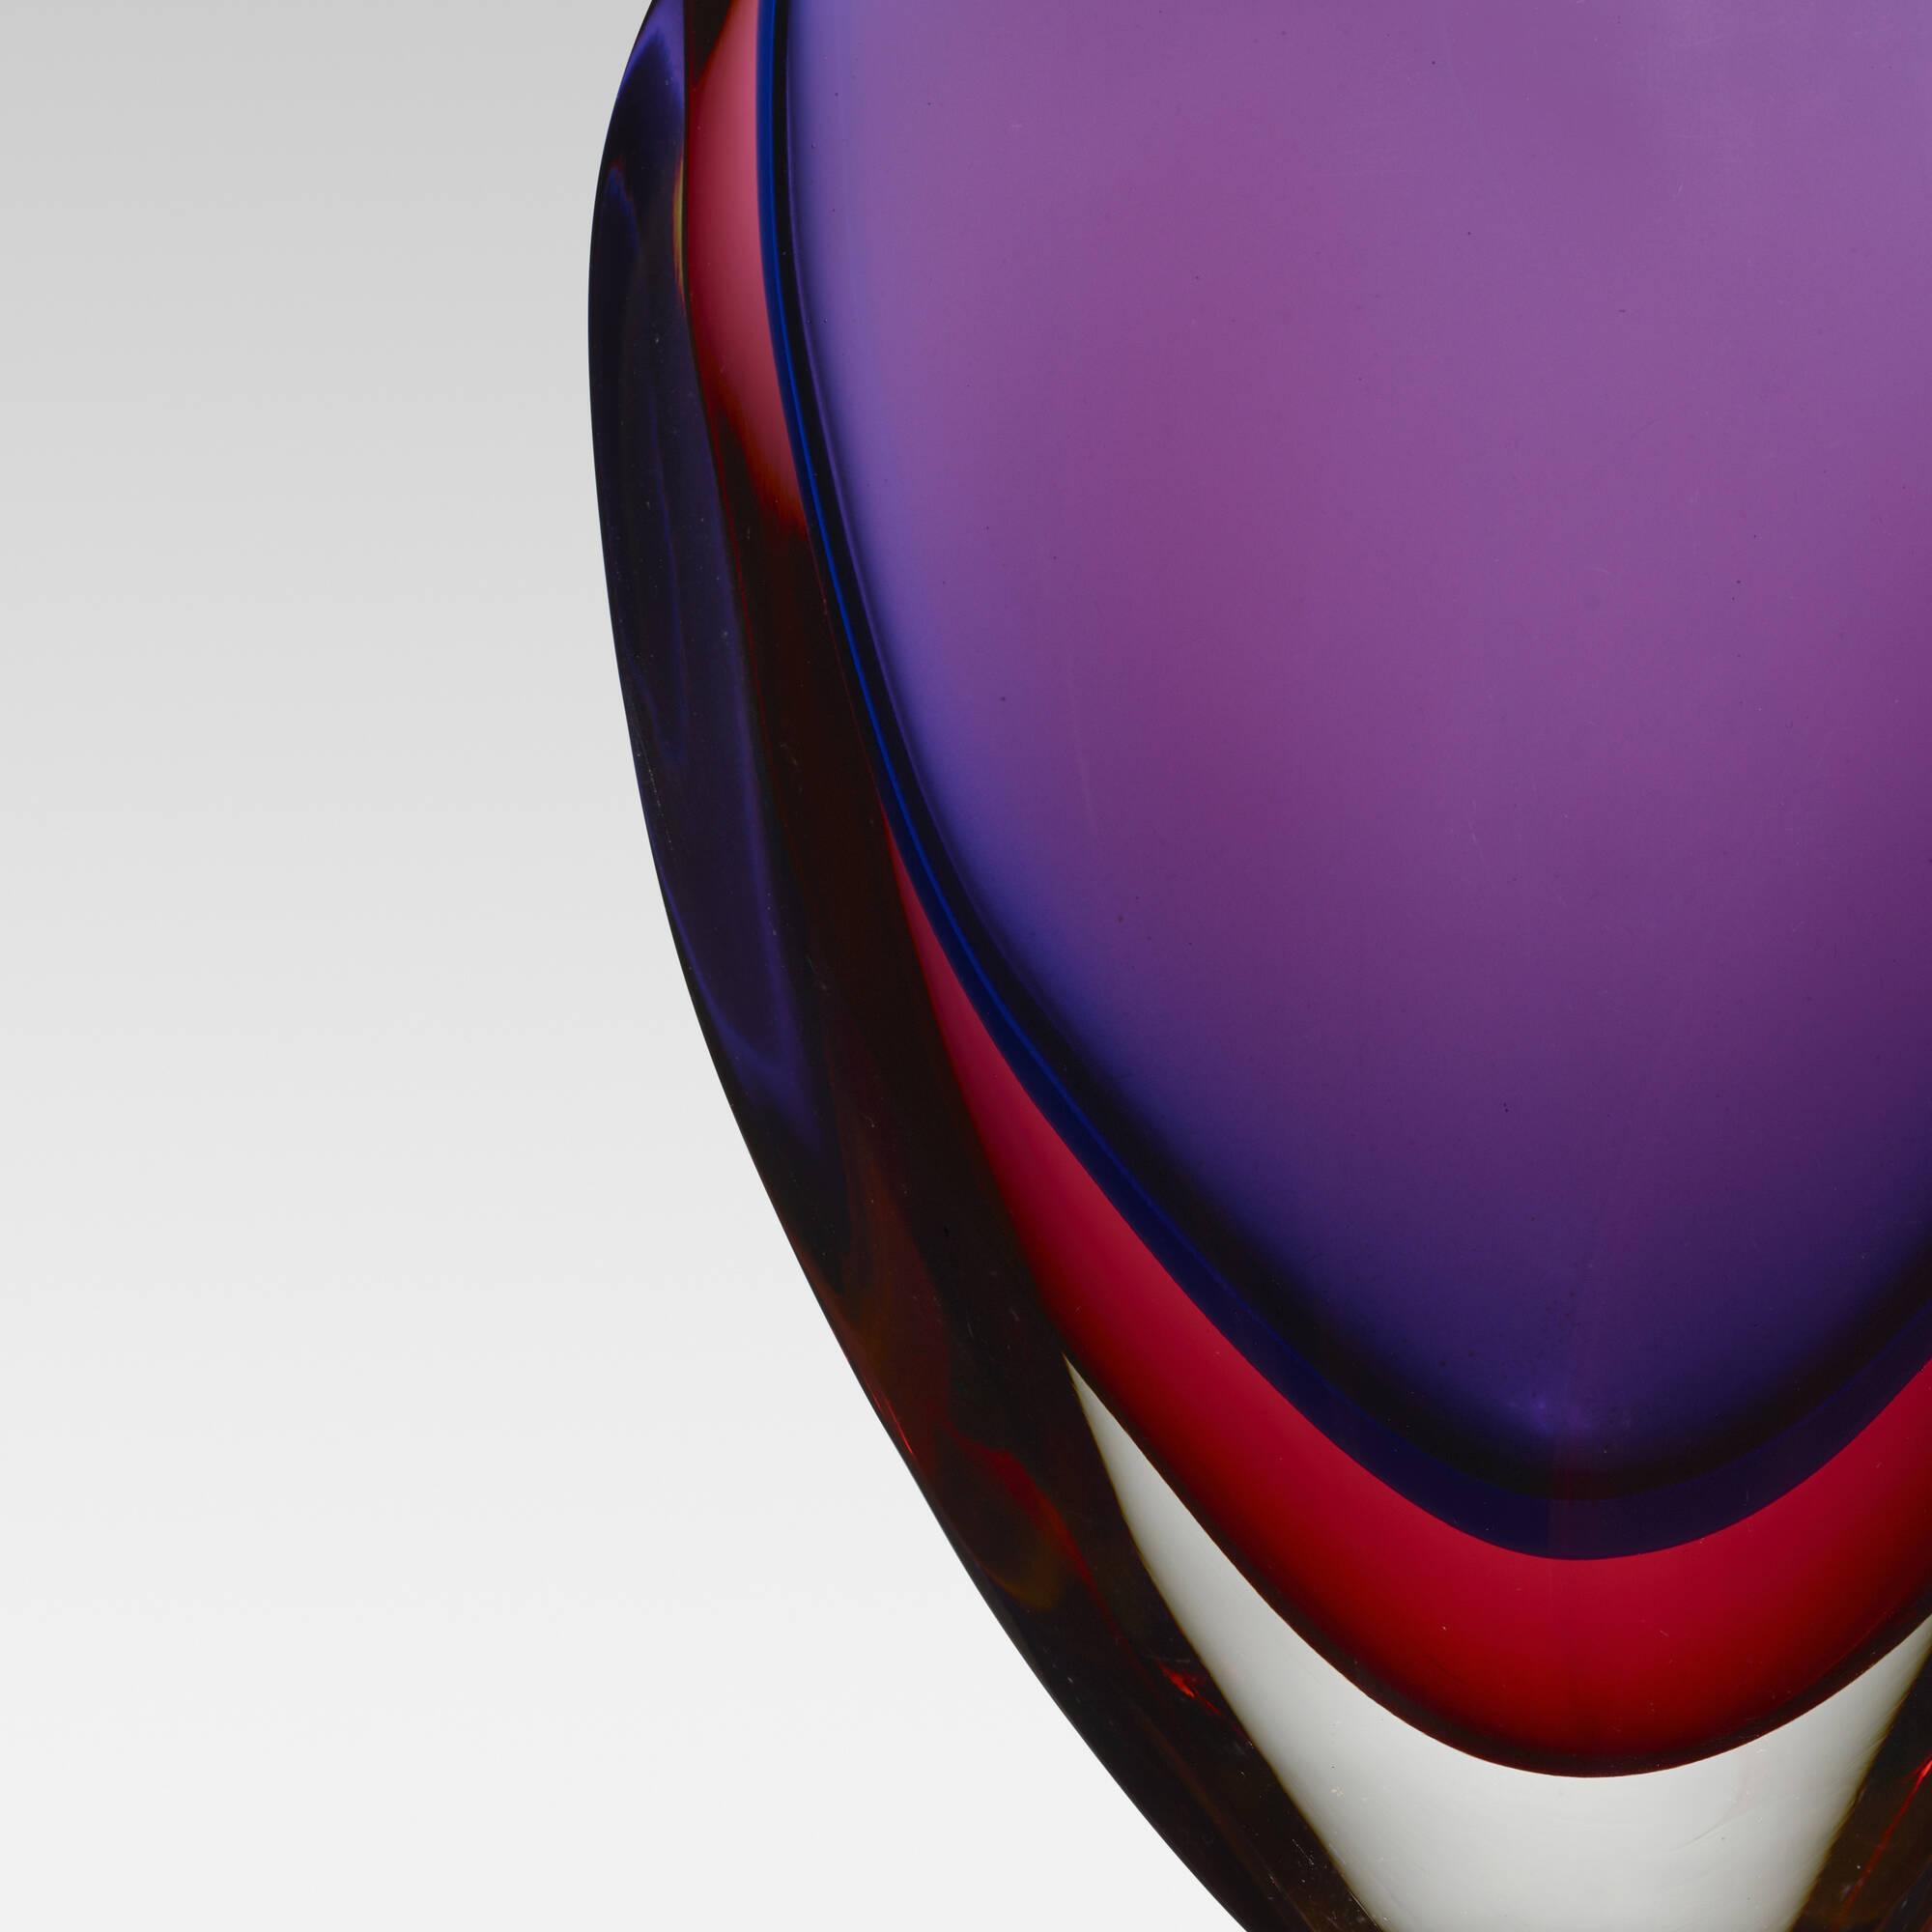 162: Flavio Poli / Valva vase, model 9814 (2 of 2)